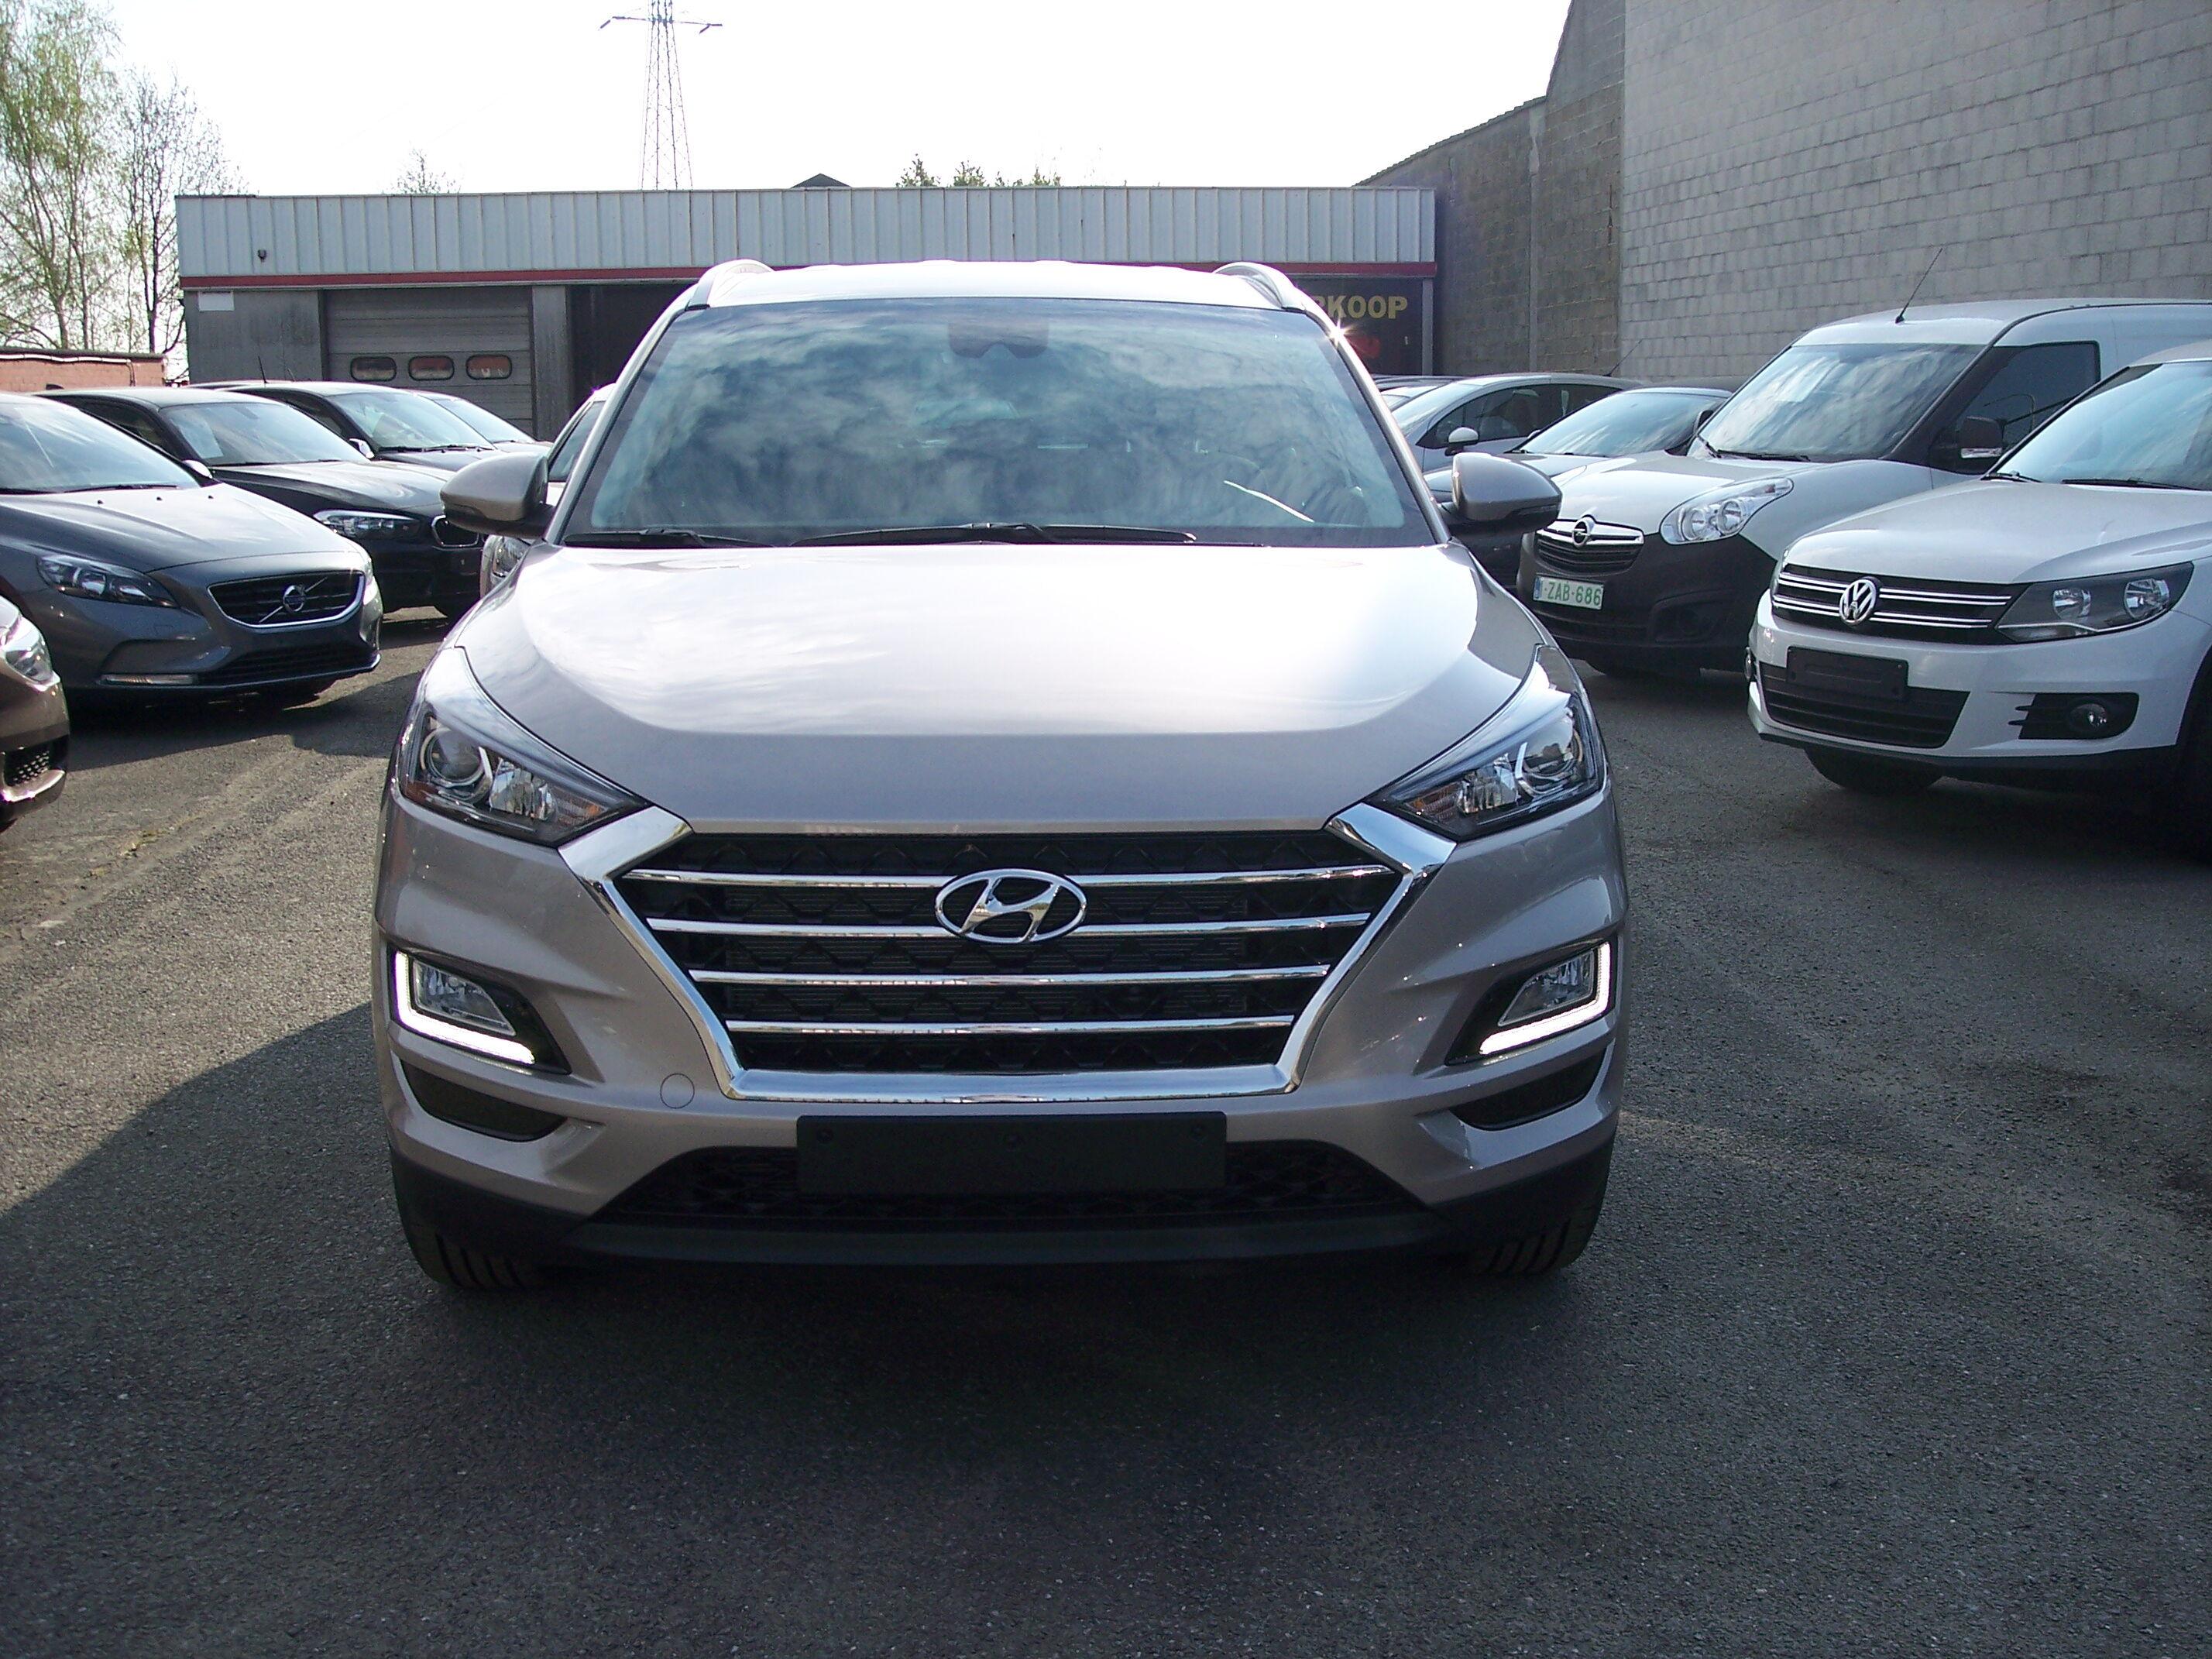 Hyundai Tuson NEW TUCSON PREMIUM 1.6 GDI ISG 3/12